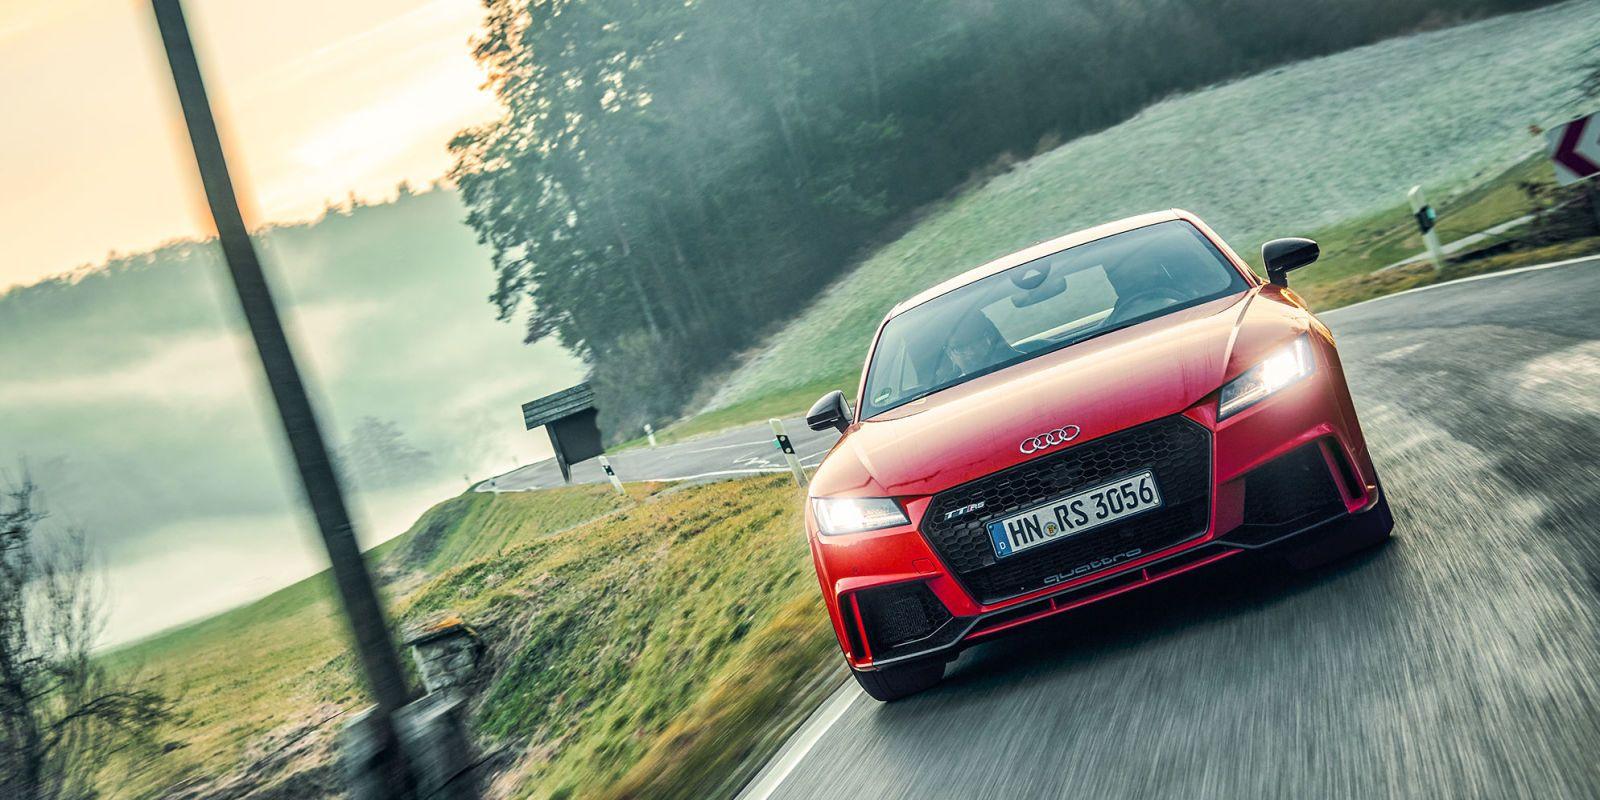 2018 Audi Tt Rs First Drive Road Track Test. Audi. Audi Tt 1 8t 2000 Ground Wiring Location At Scoala.co